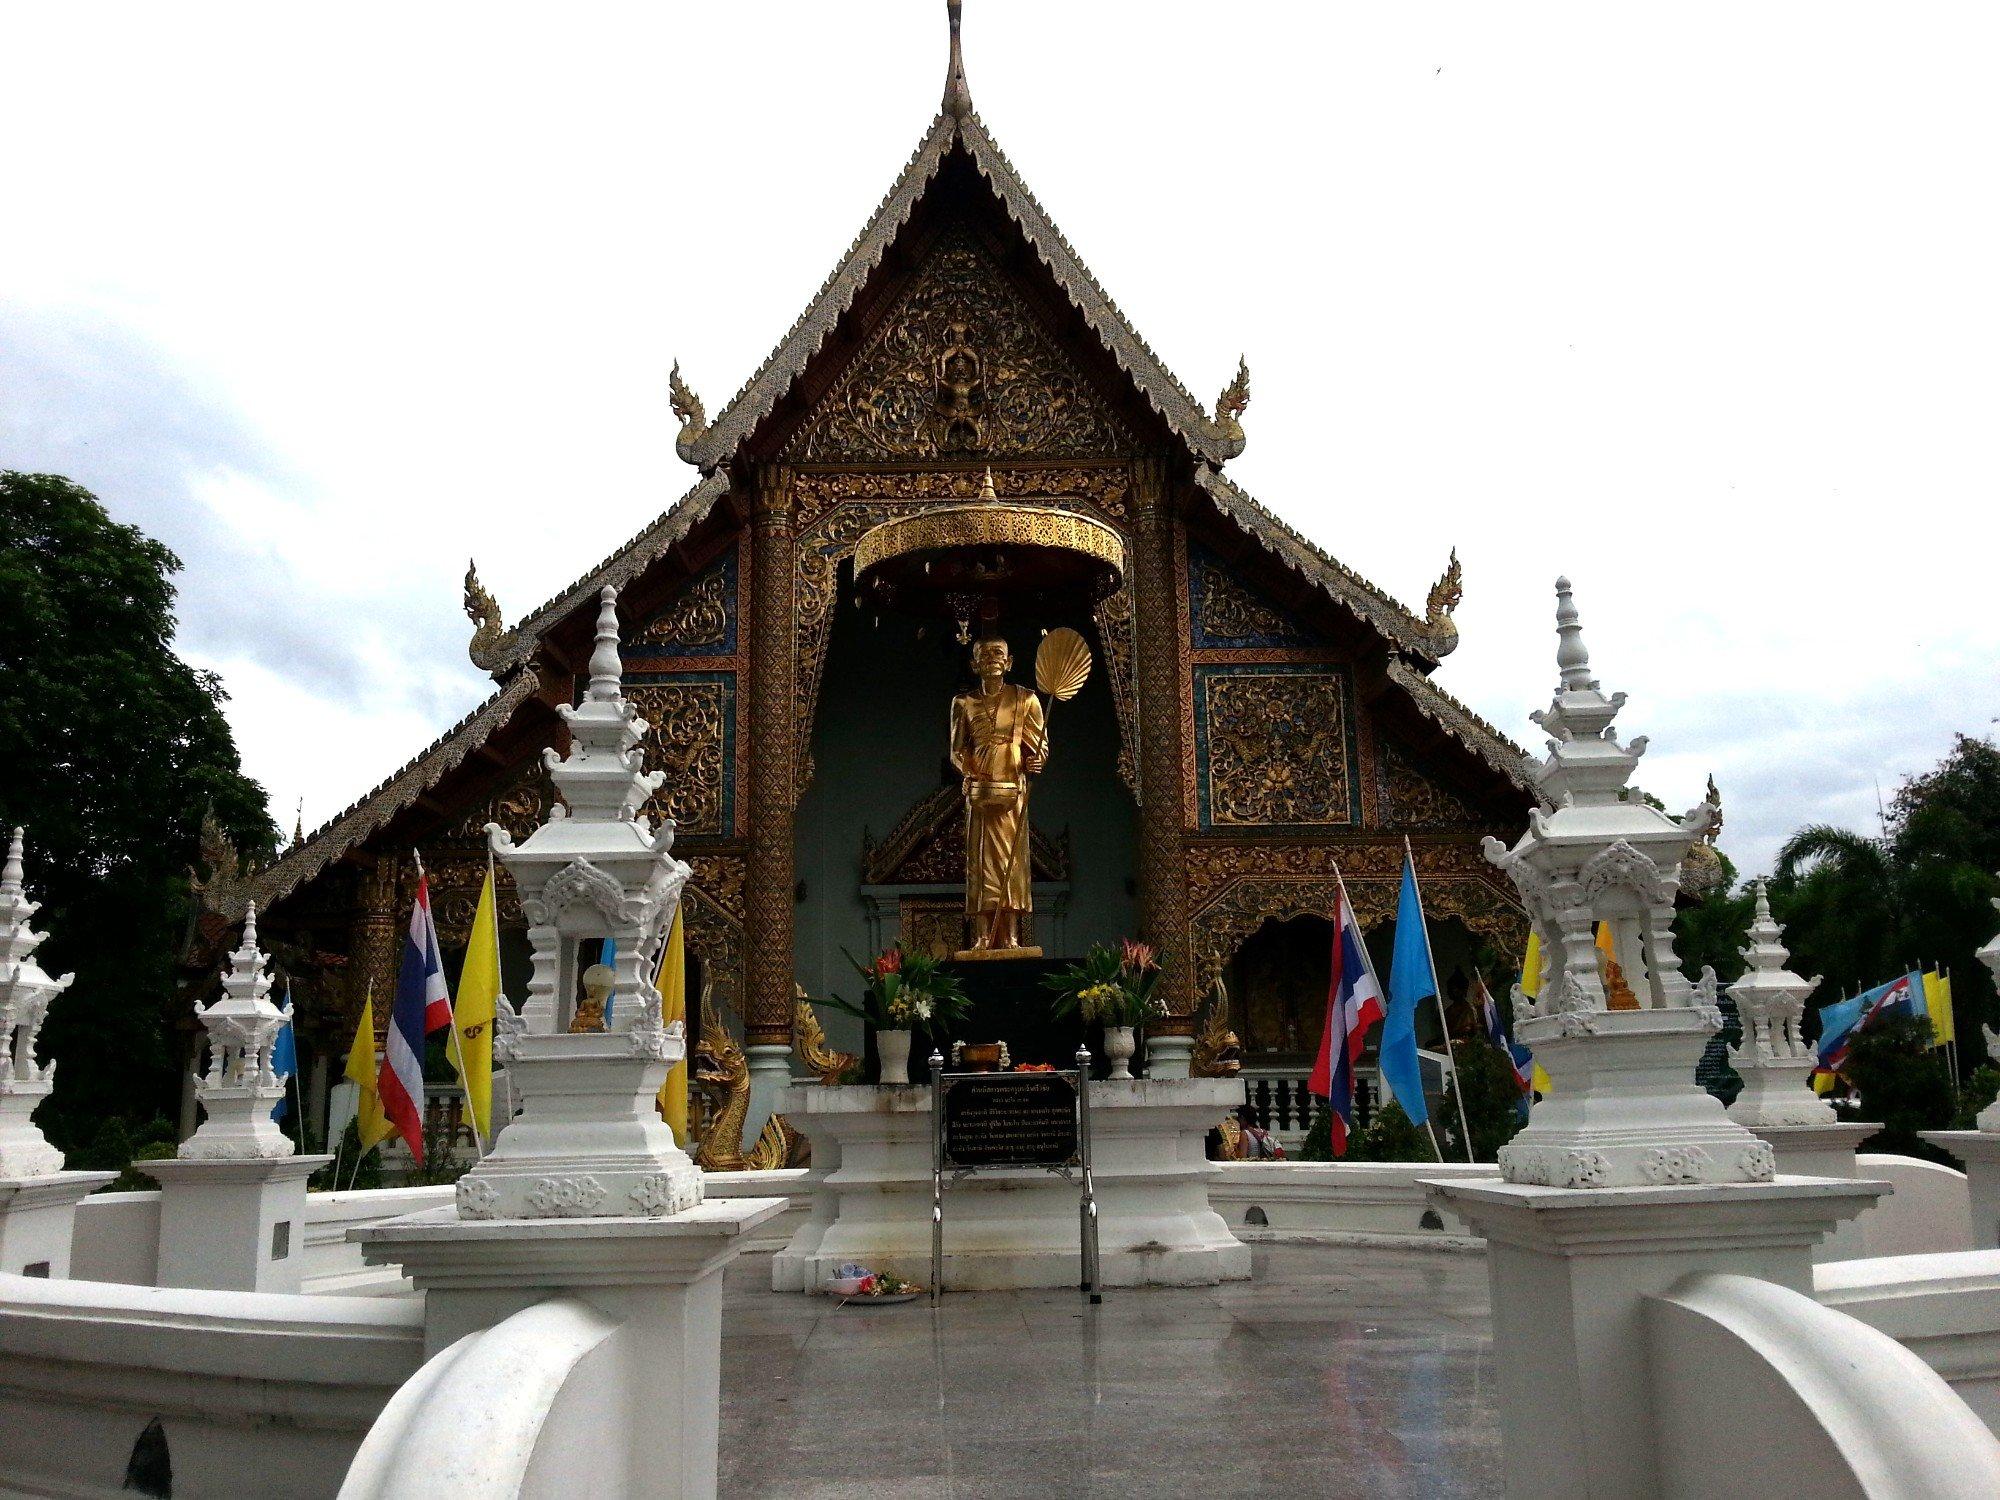 Viharn Luang at Wat Phra Singh